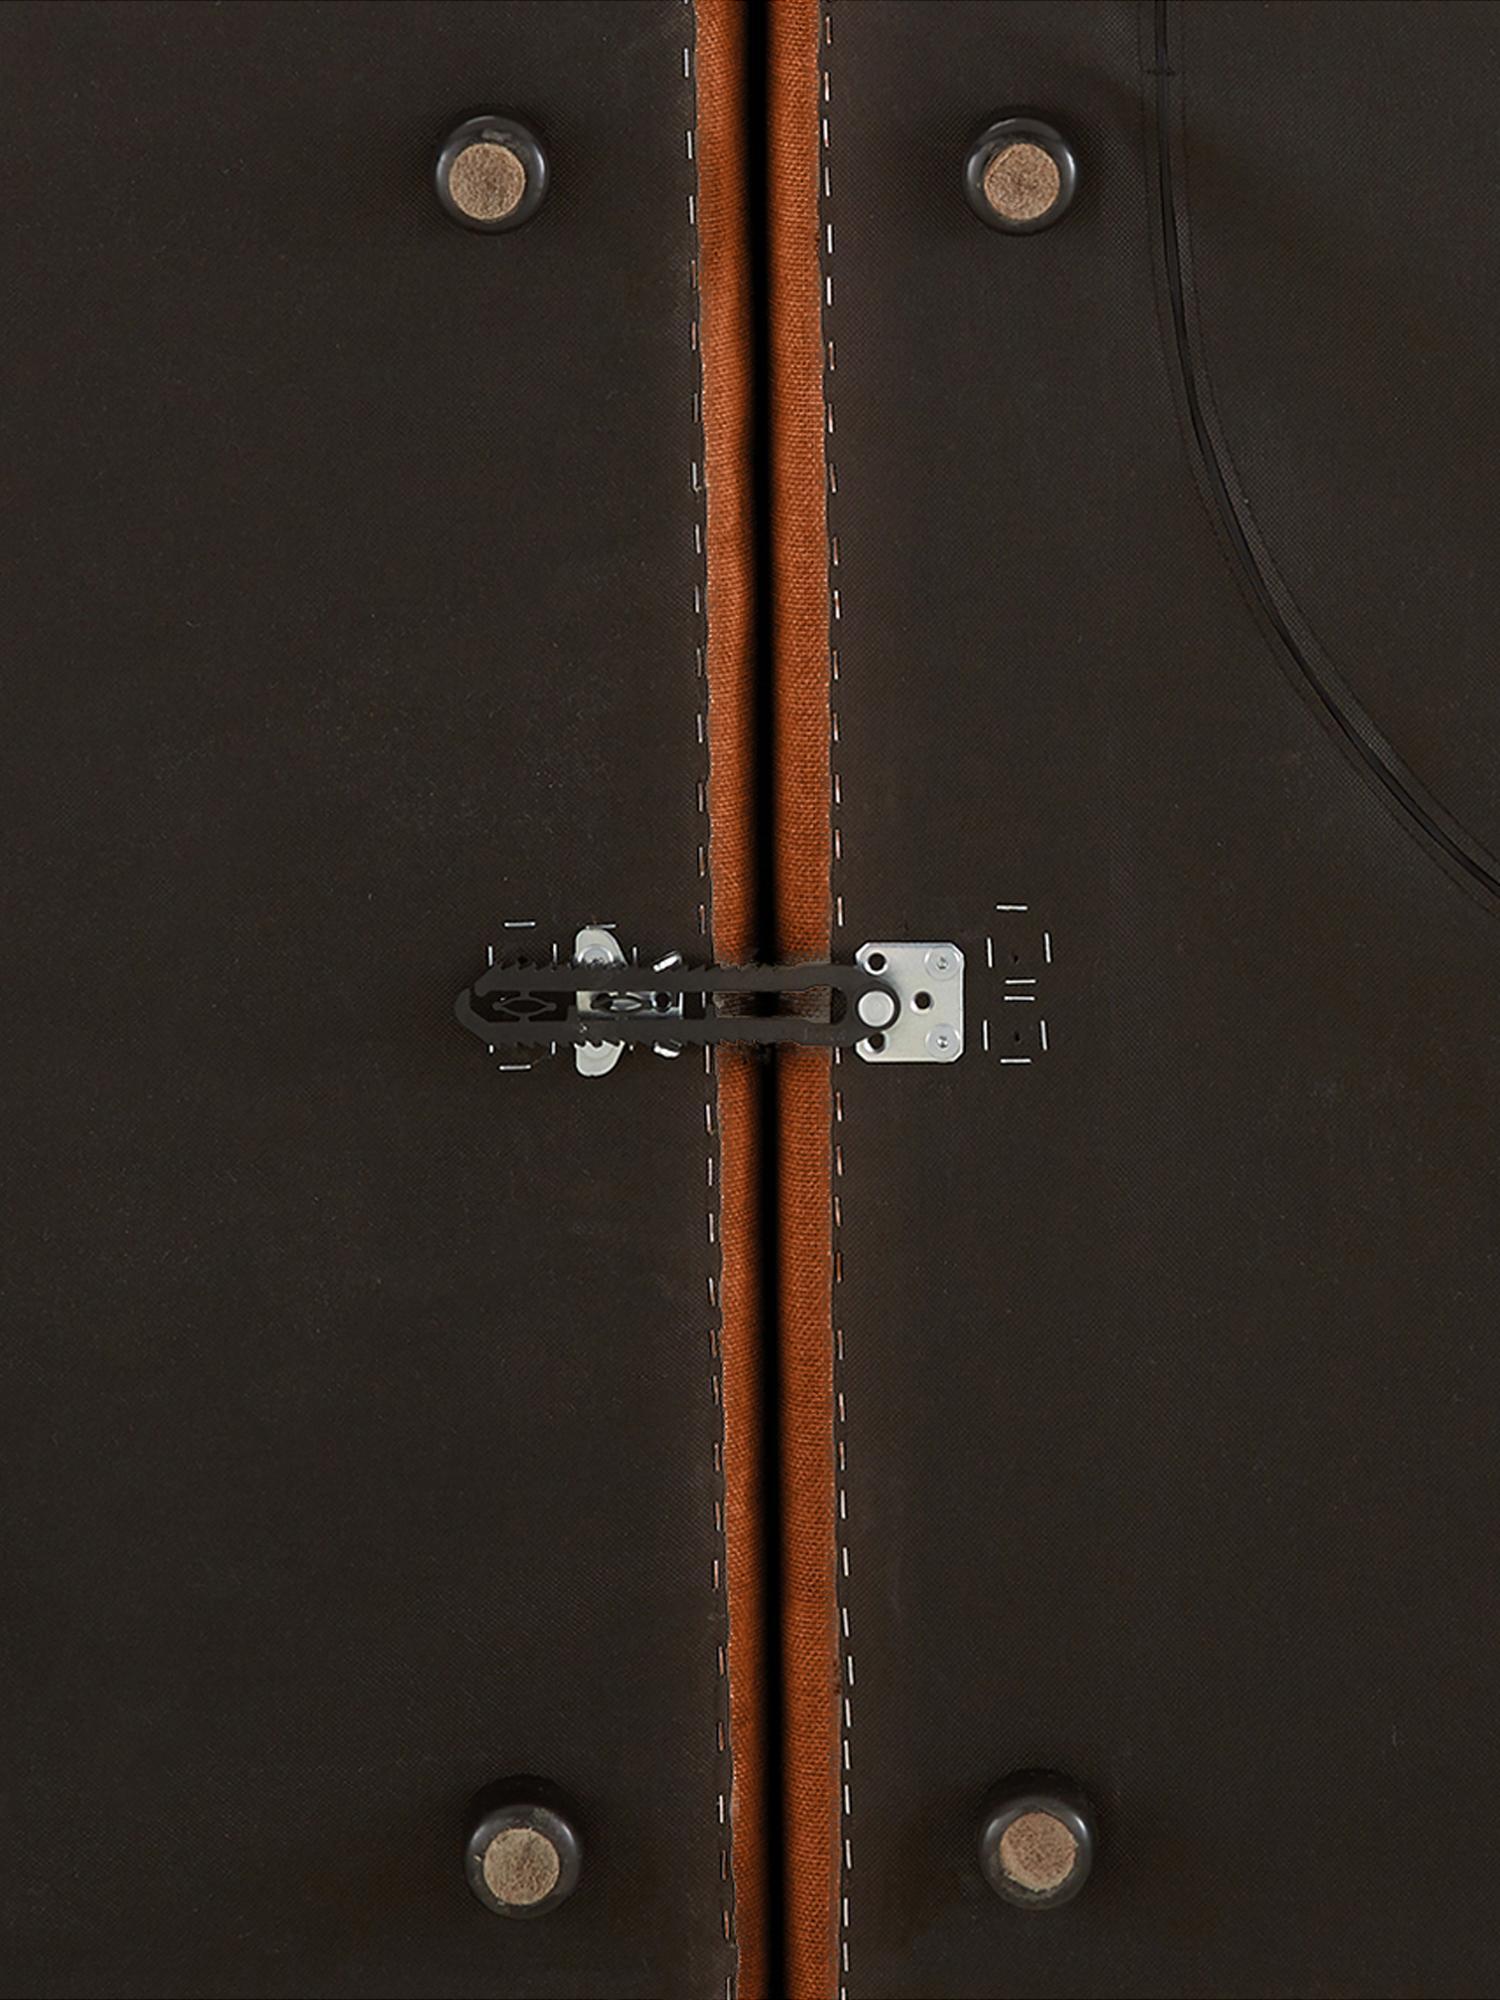 Modulare Ottomane Lennon, Bezug: Polyester Der hochwertige, Gestell: Massives Kiefernholz, Spe, Füße: Kunststoff, Webstoff Terrakotta, B 269 x T 119 cm